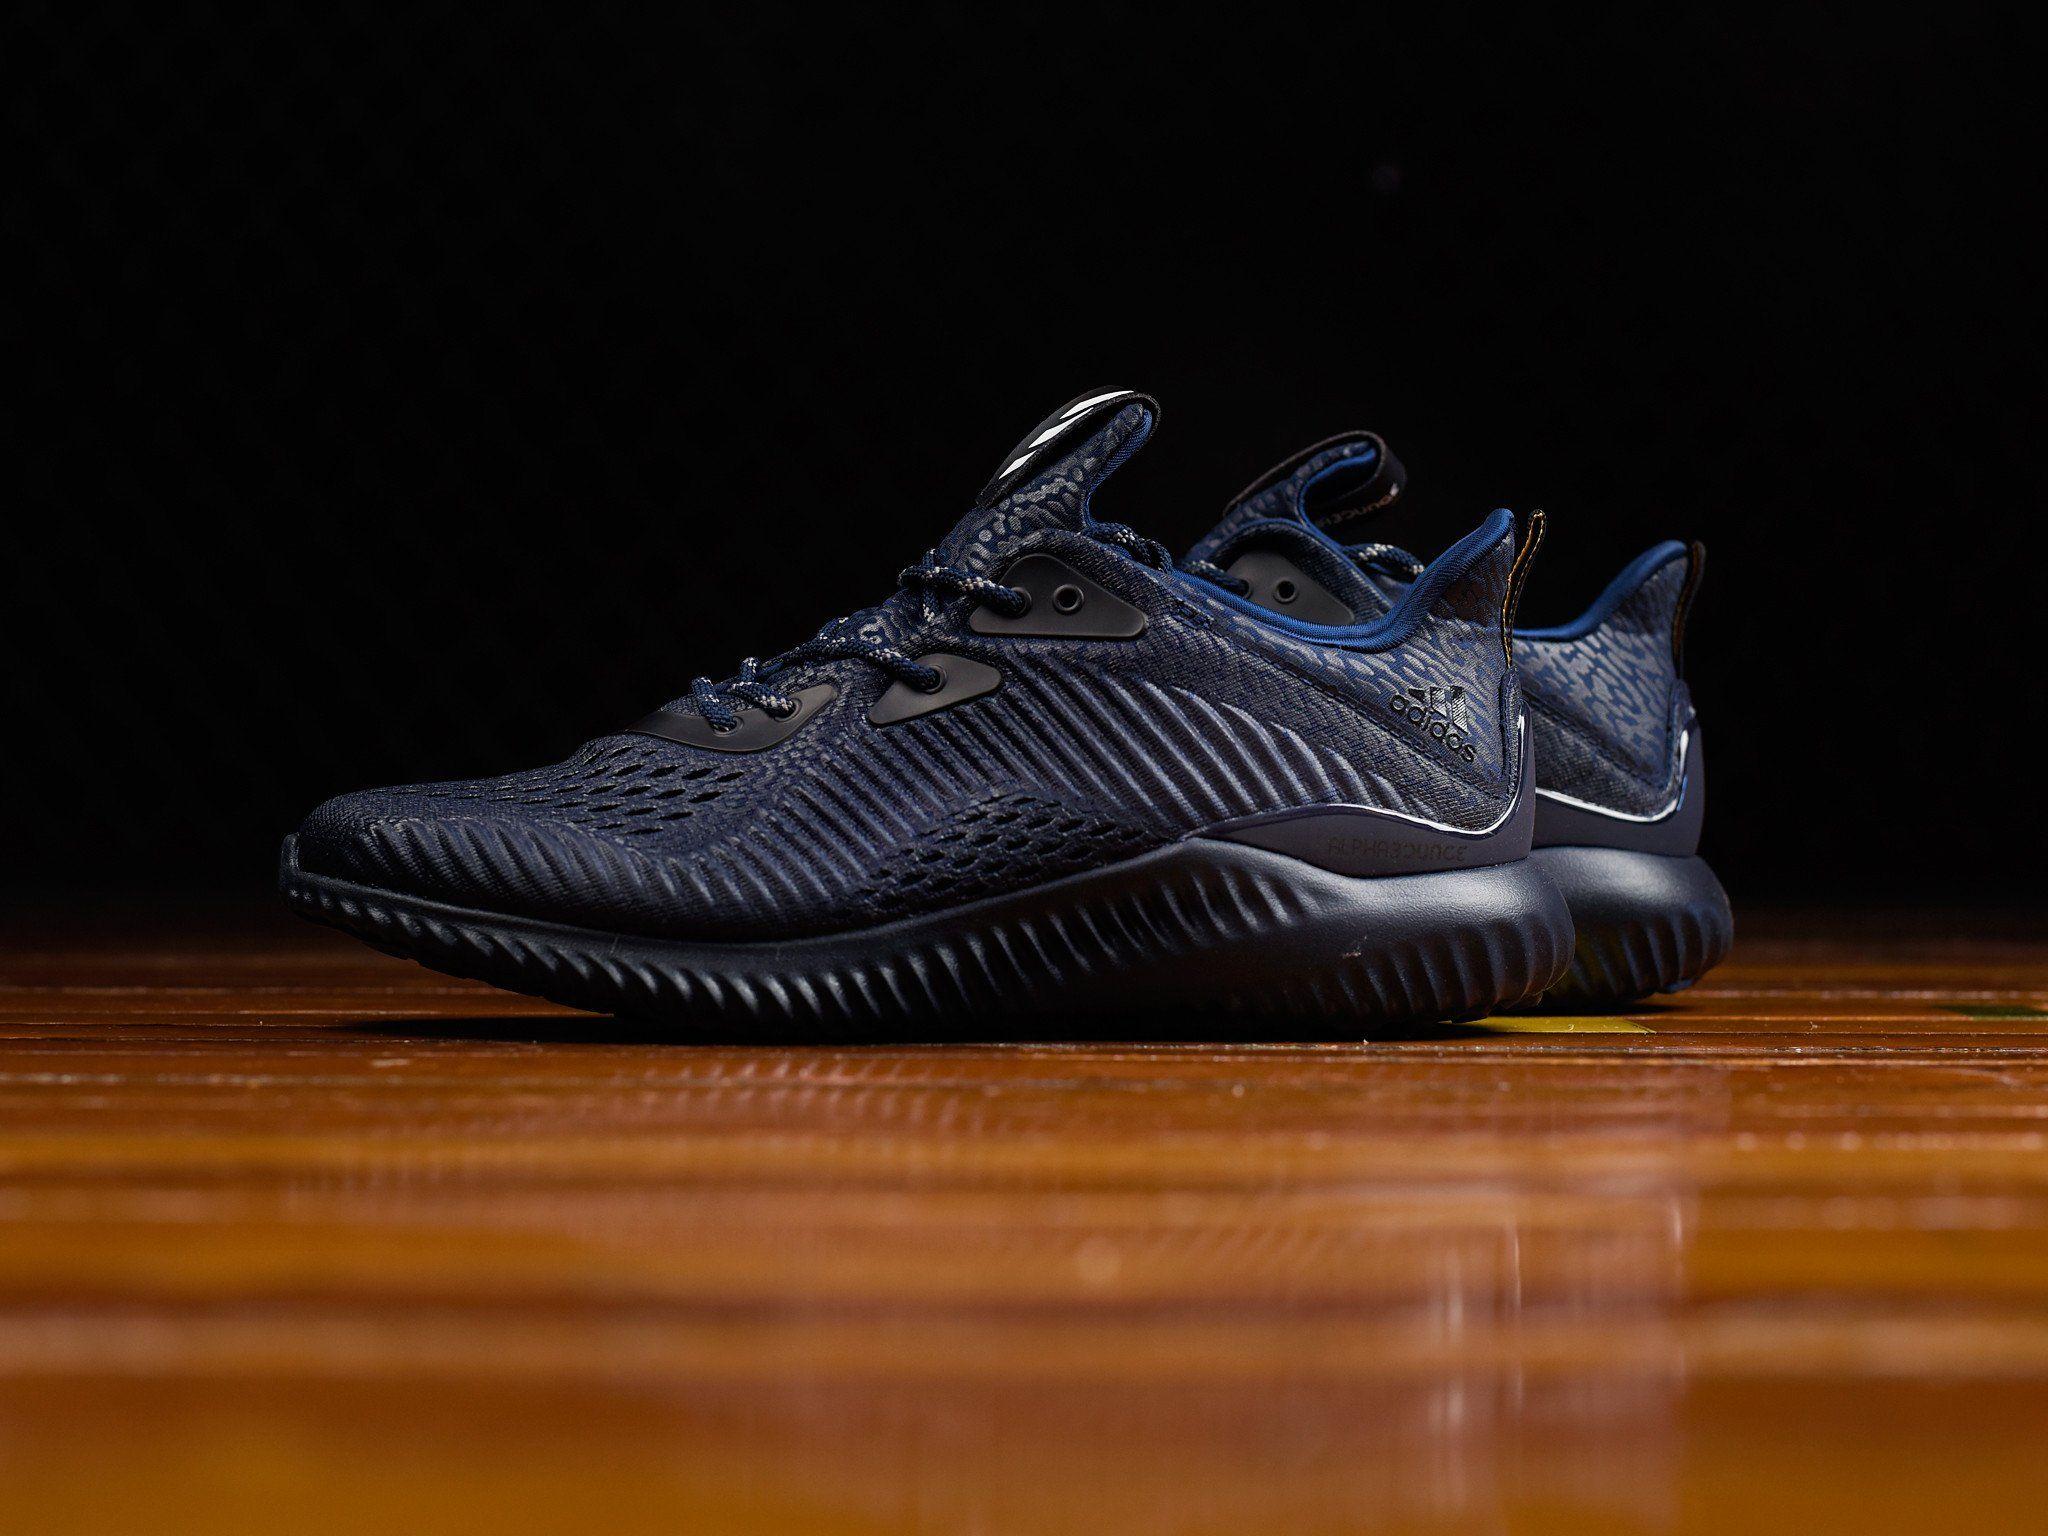 New Trendy Adidas Alphabounce Ams Mystery Blue Collegiate Navy Black For Men Online